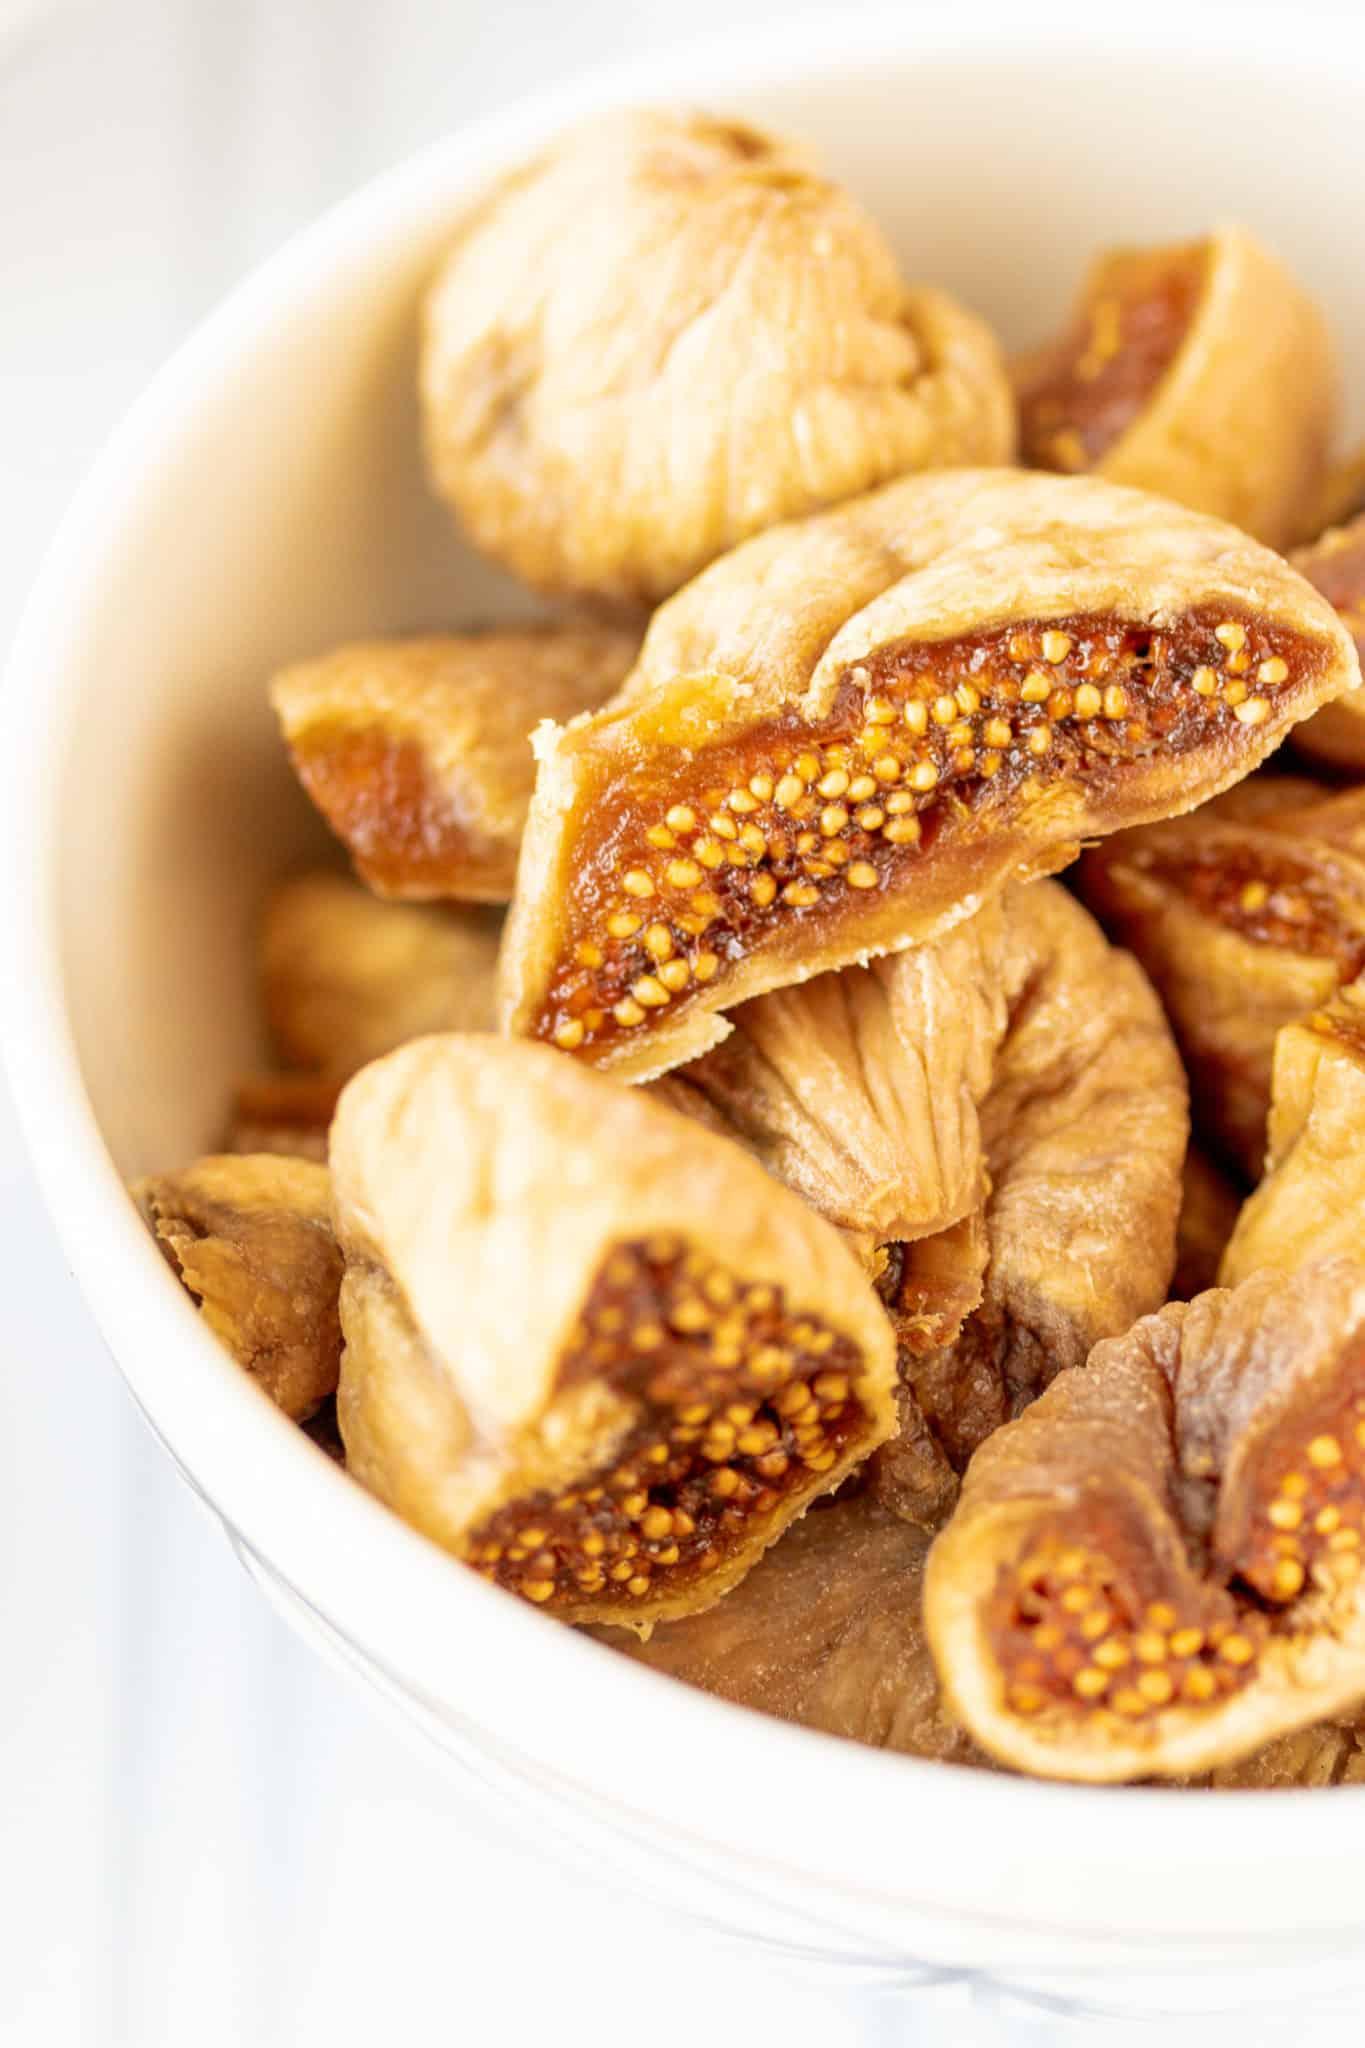 dried figs cut in half